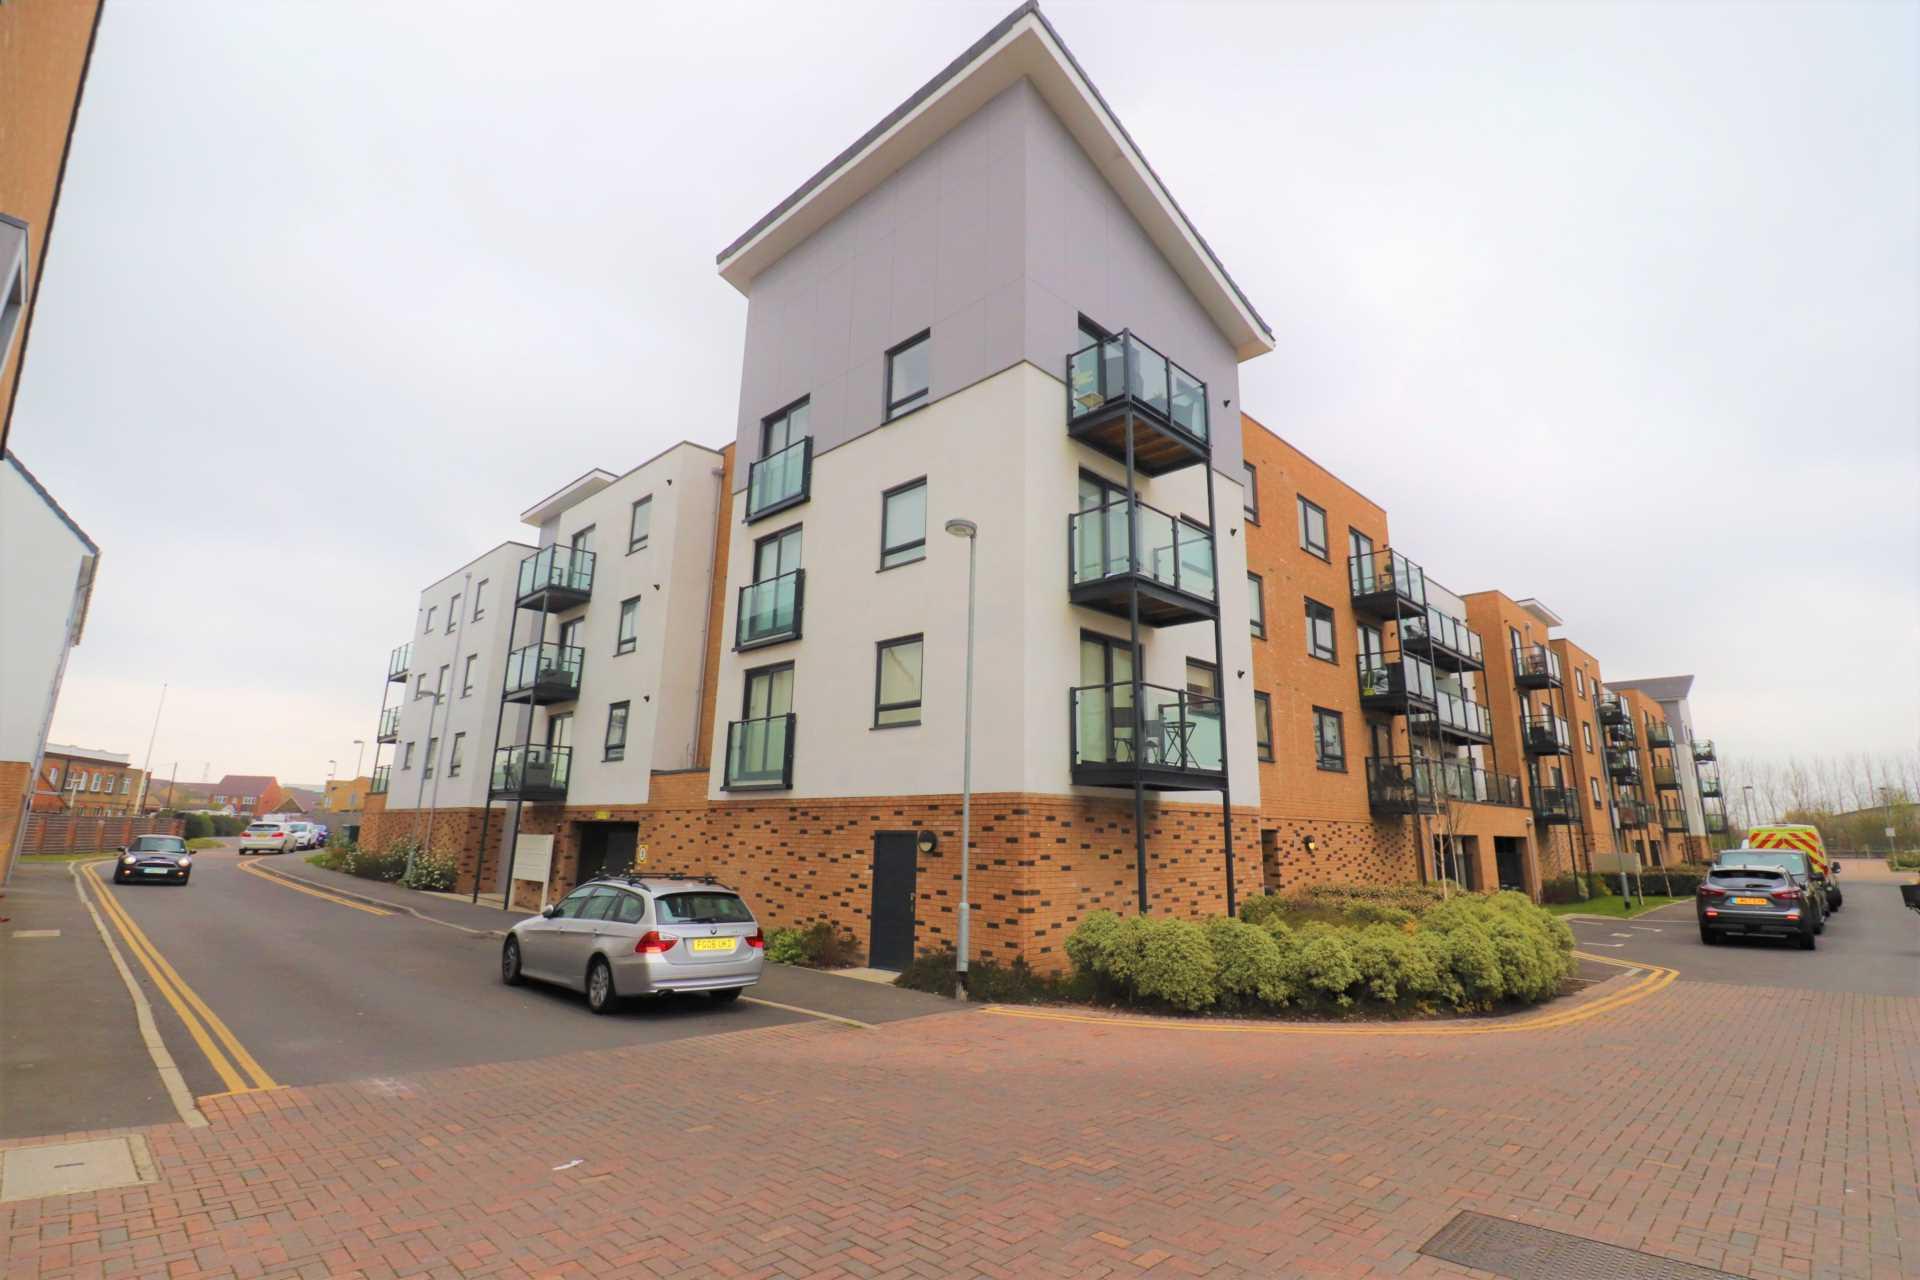 Property King Estate Agents - 2 Bedroom Apartment, Creek Mill Way, Dartford